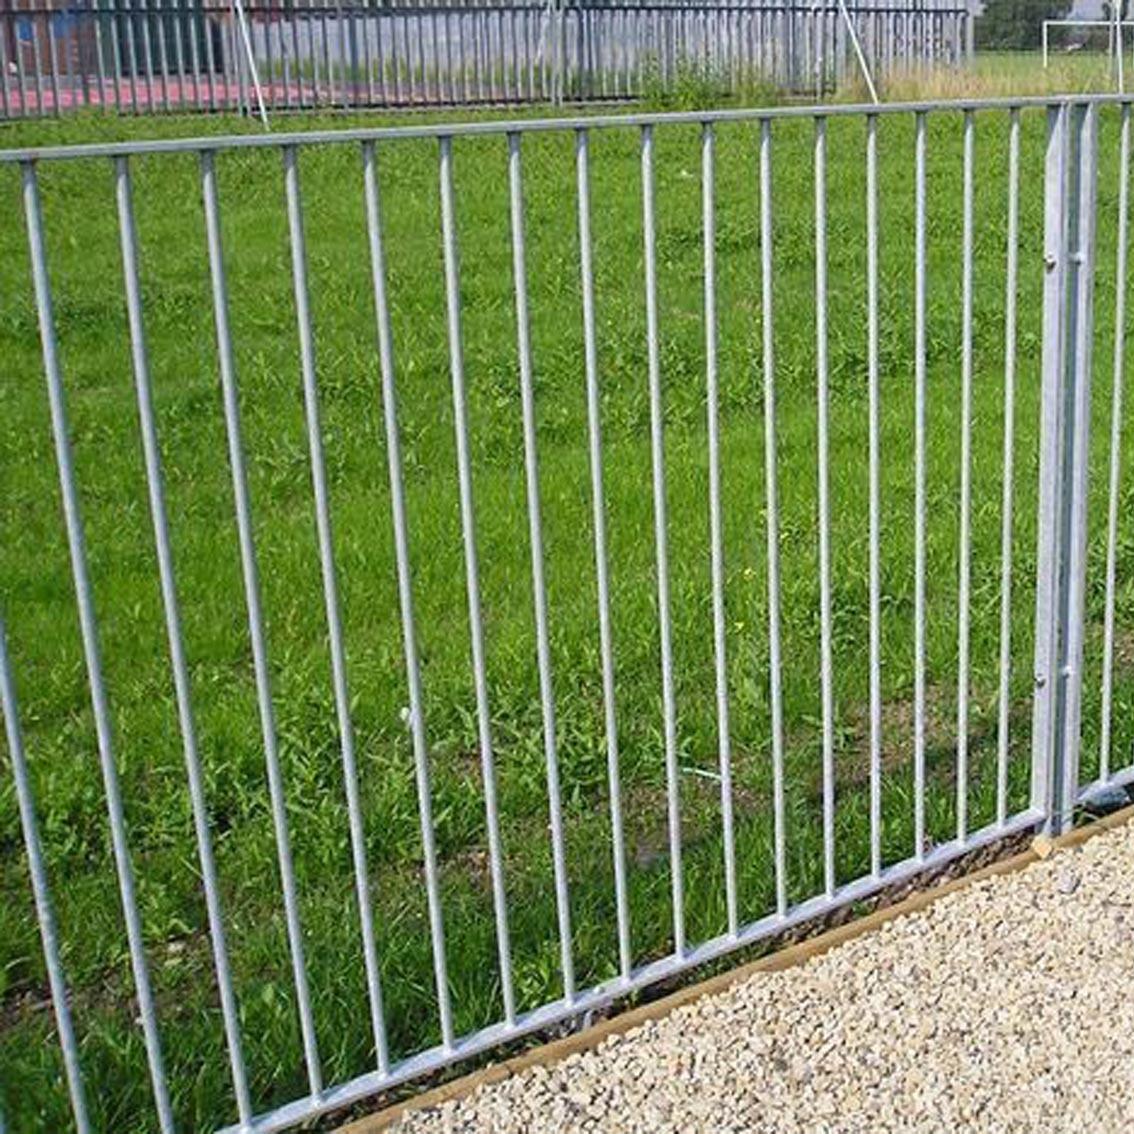 Flat_top_fencing_rail_galvanised